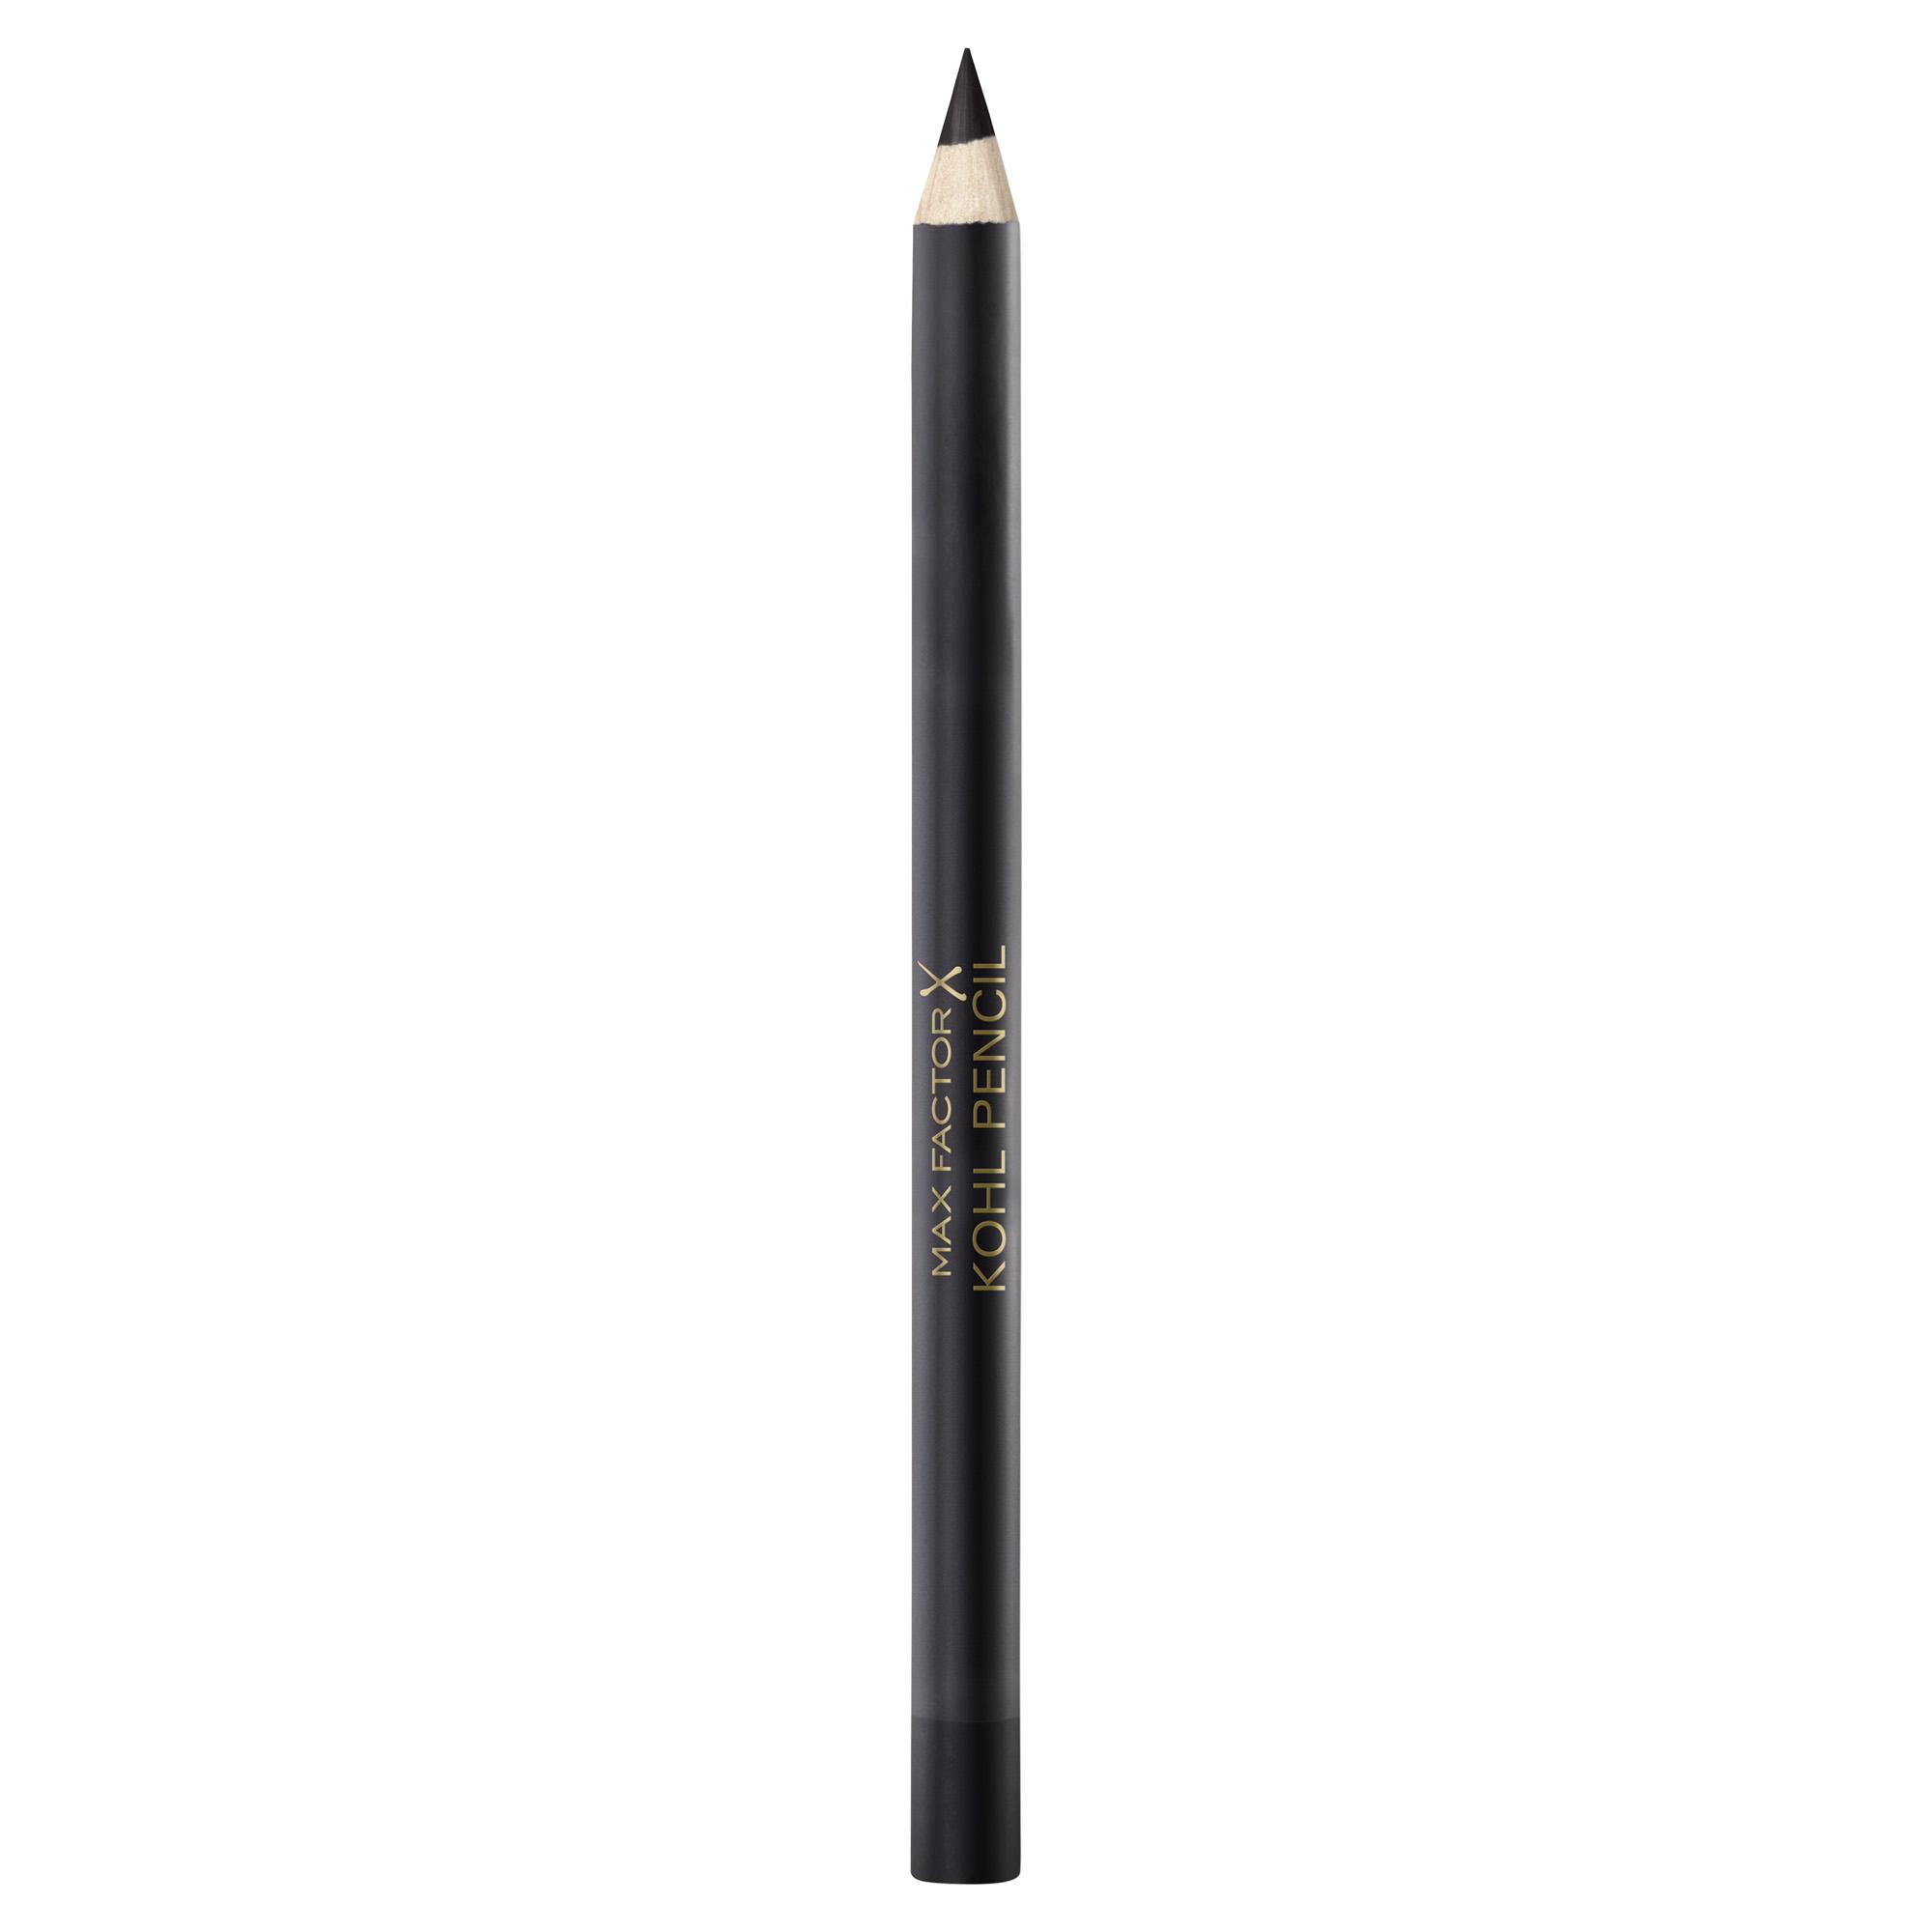 Kohl Pencil 20Black